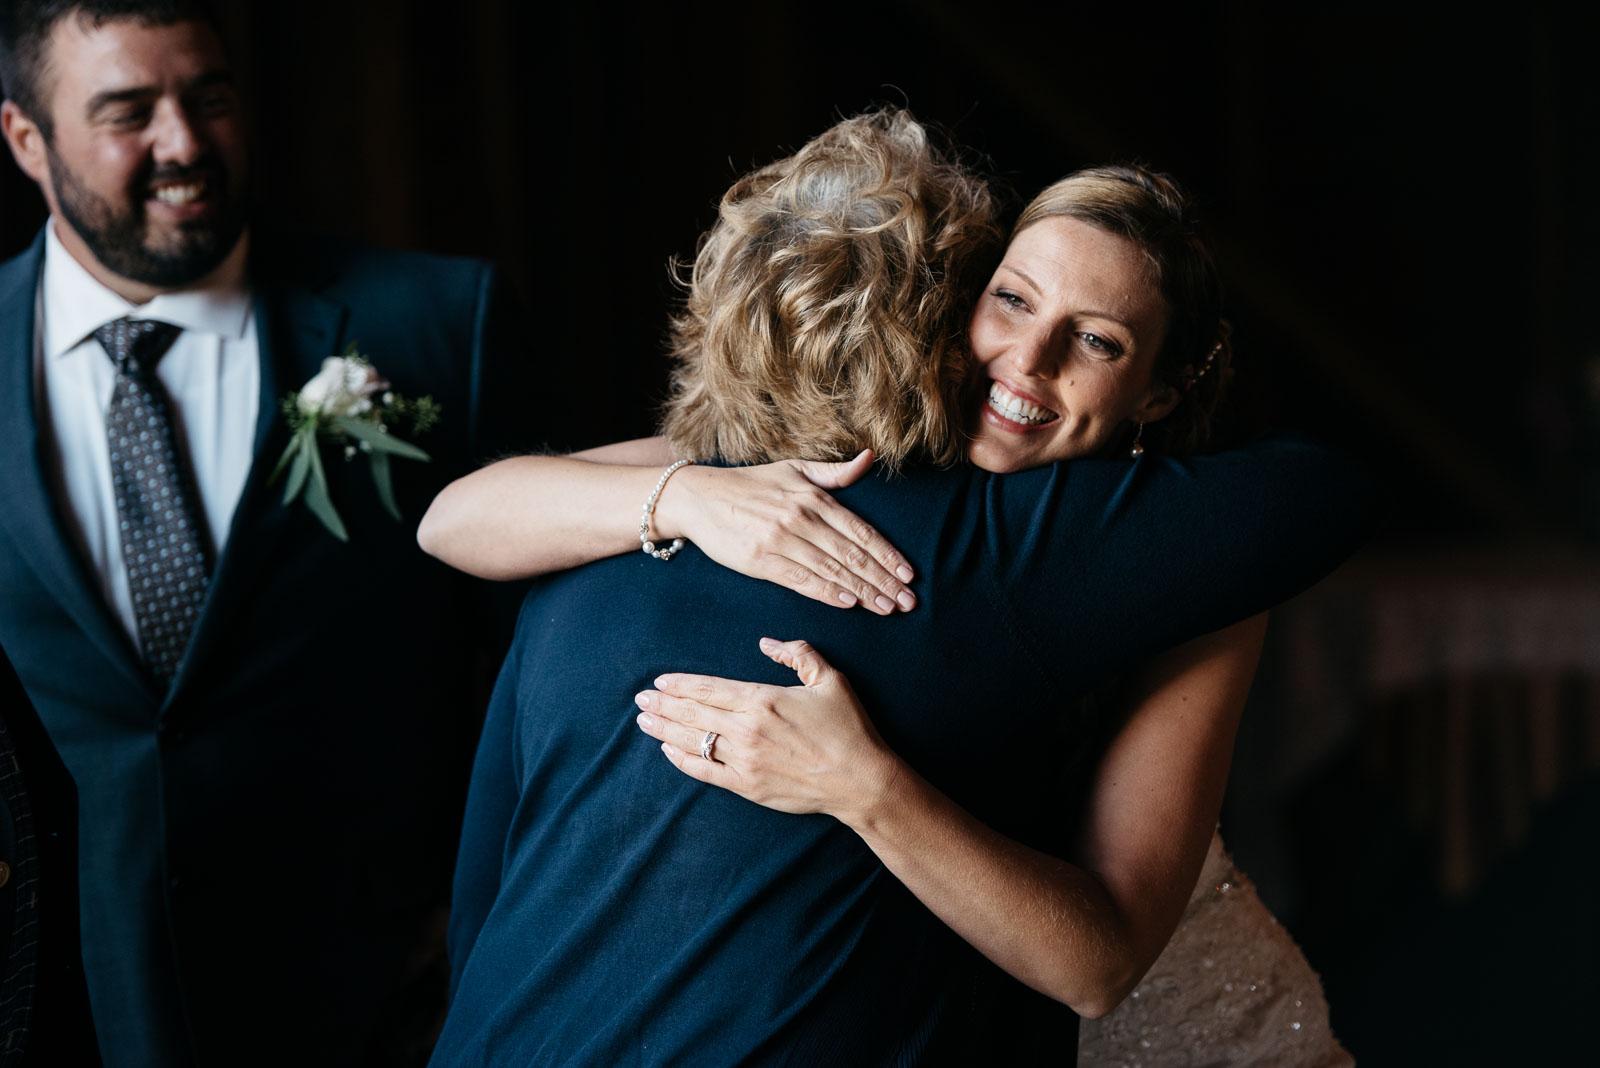 A mom hugs a bride at a wedding